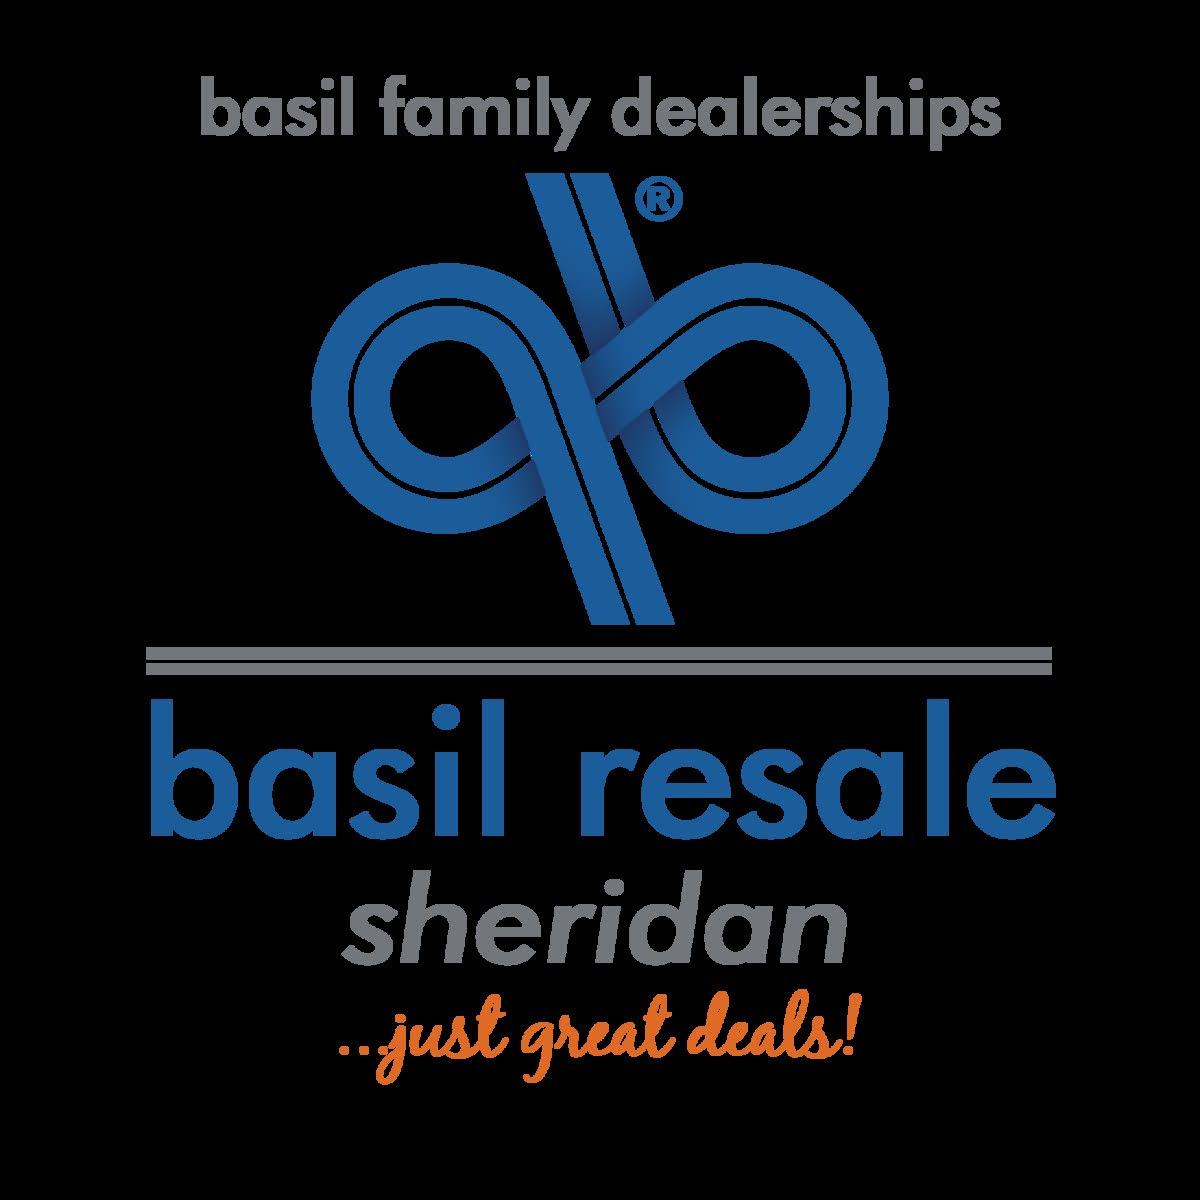 Basil Resale Sheridan Williamsville Ny Read Consumer Reviews